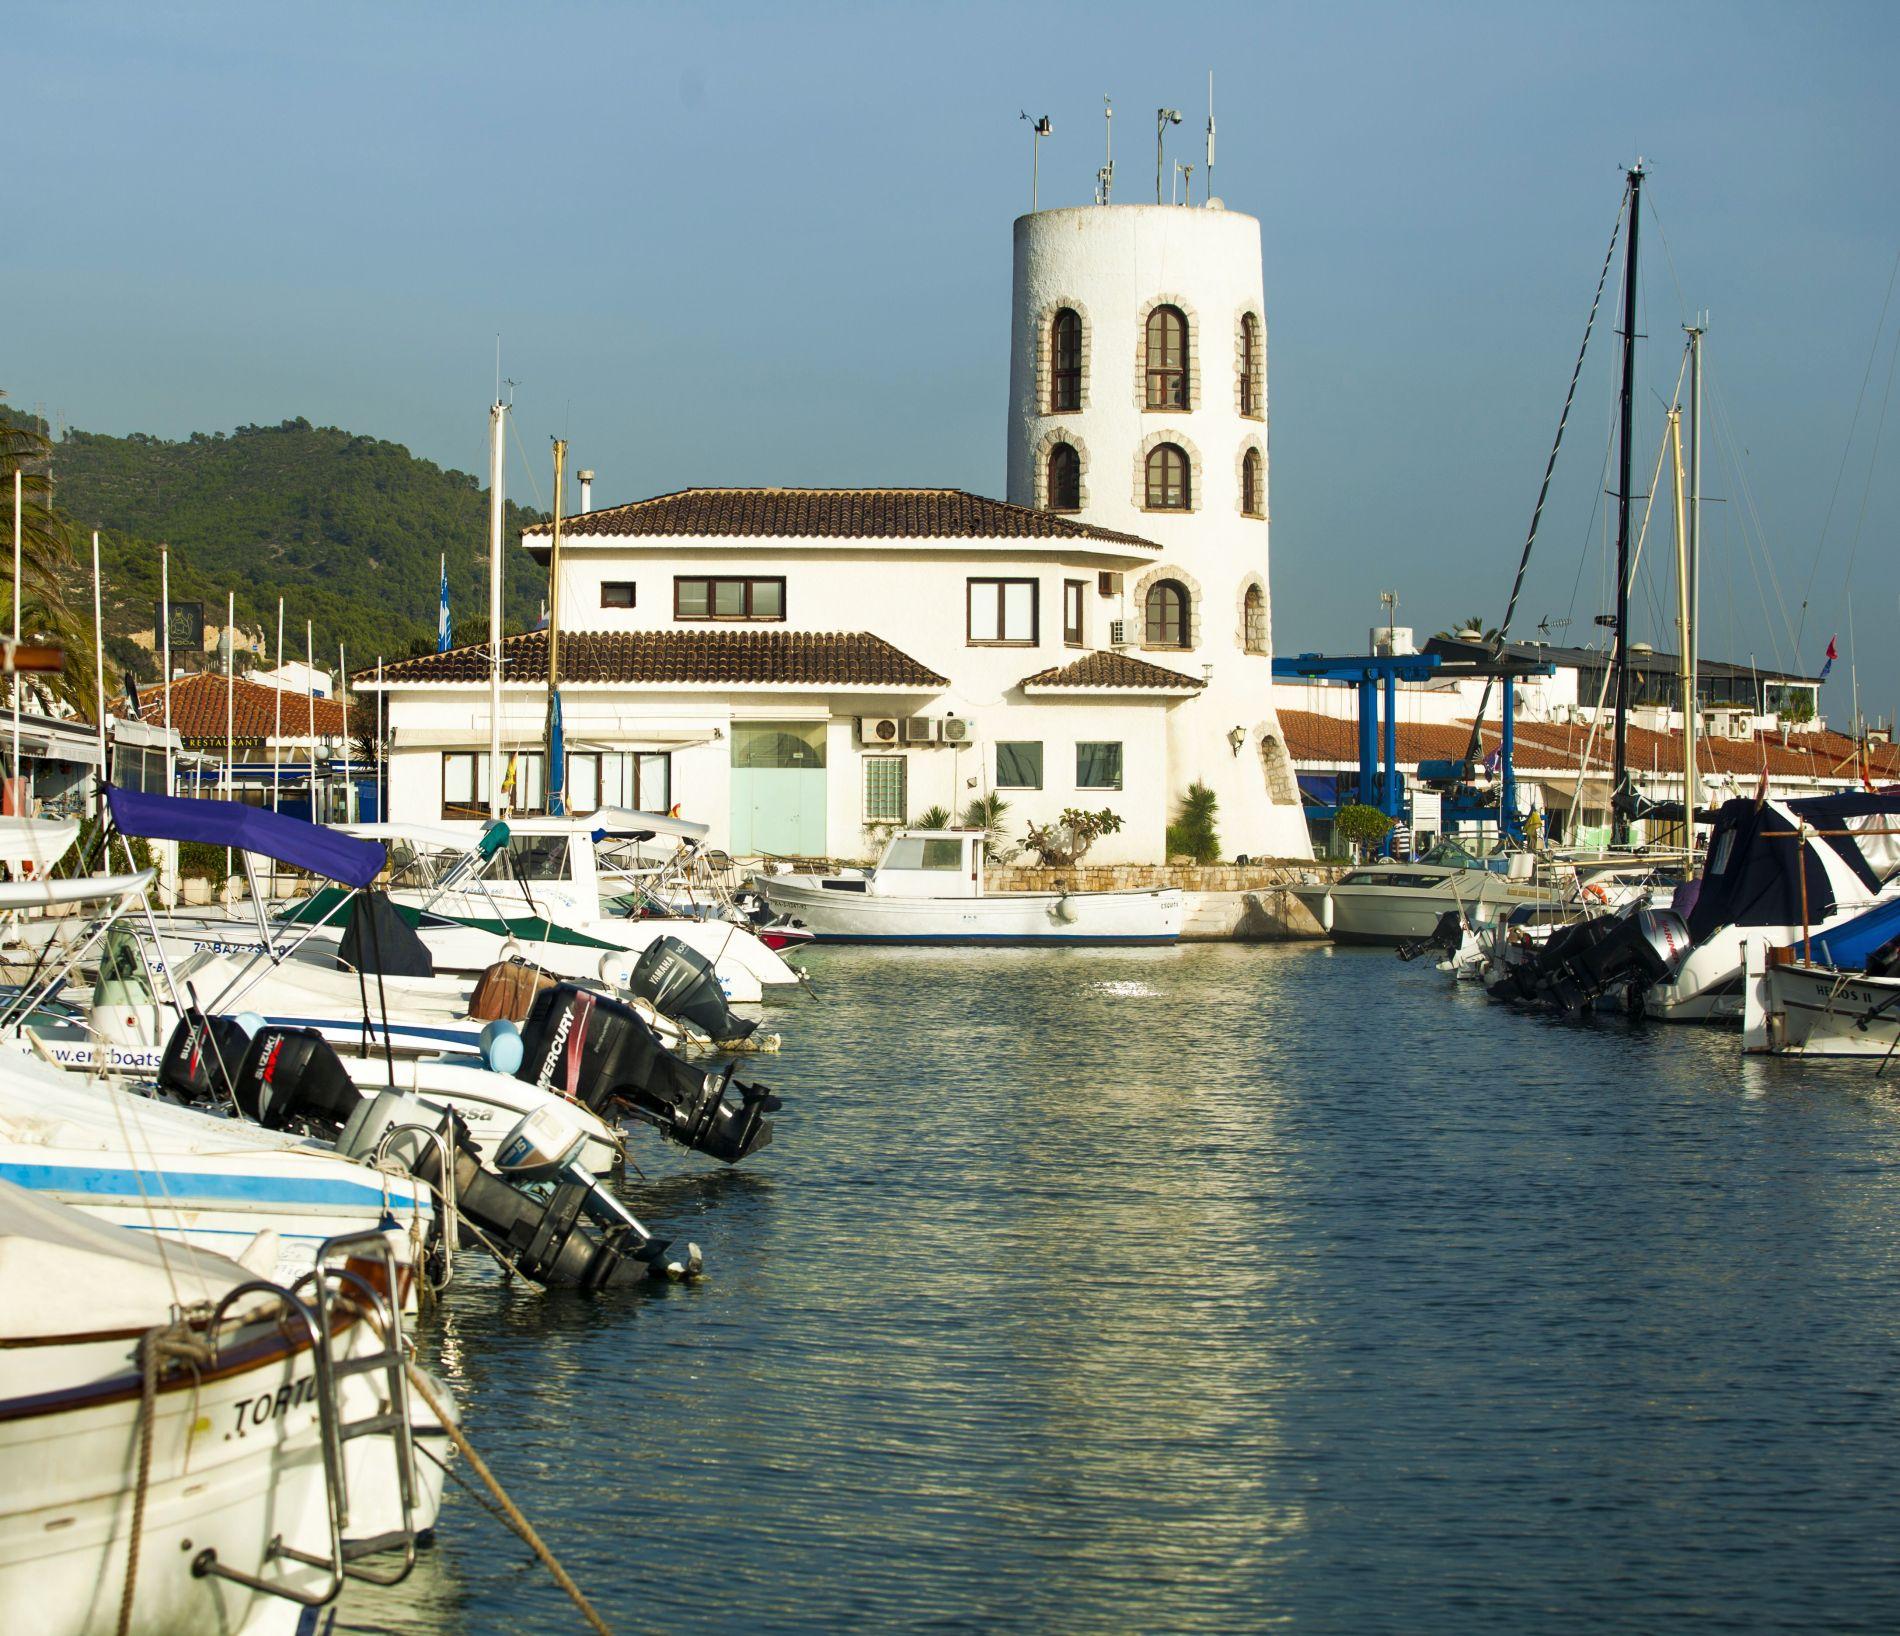 tower-at-dock